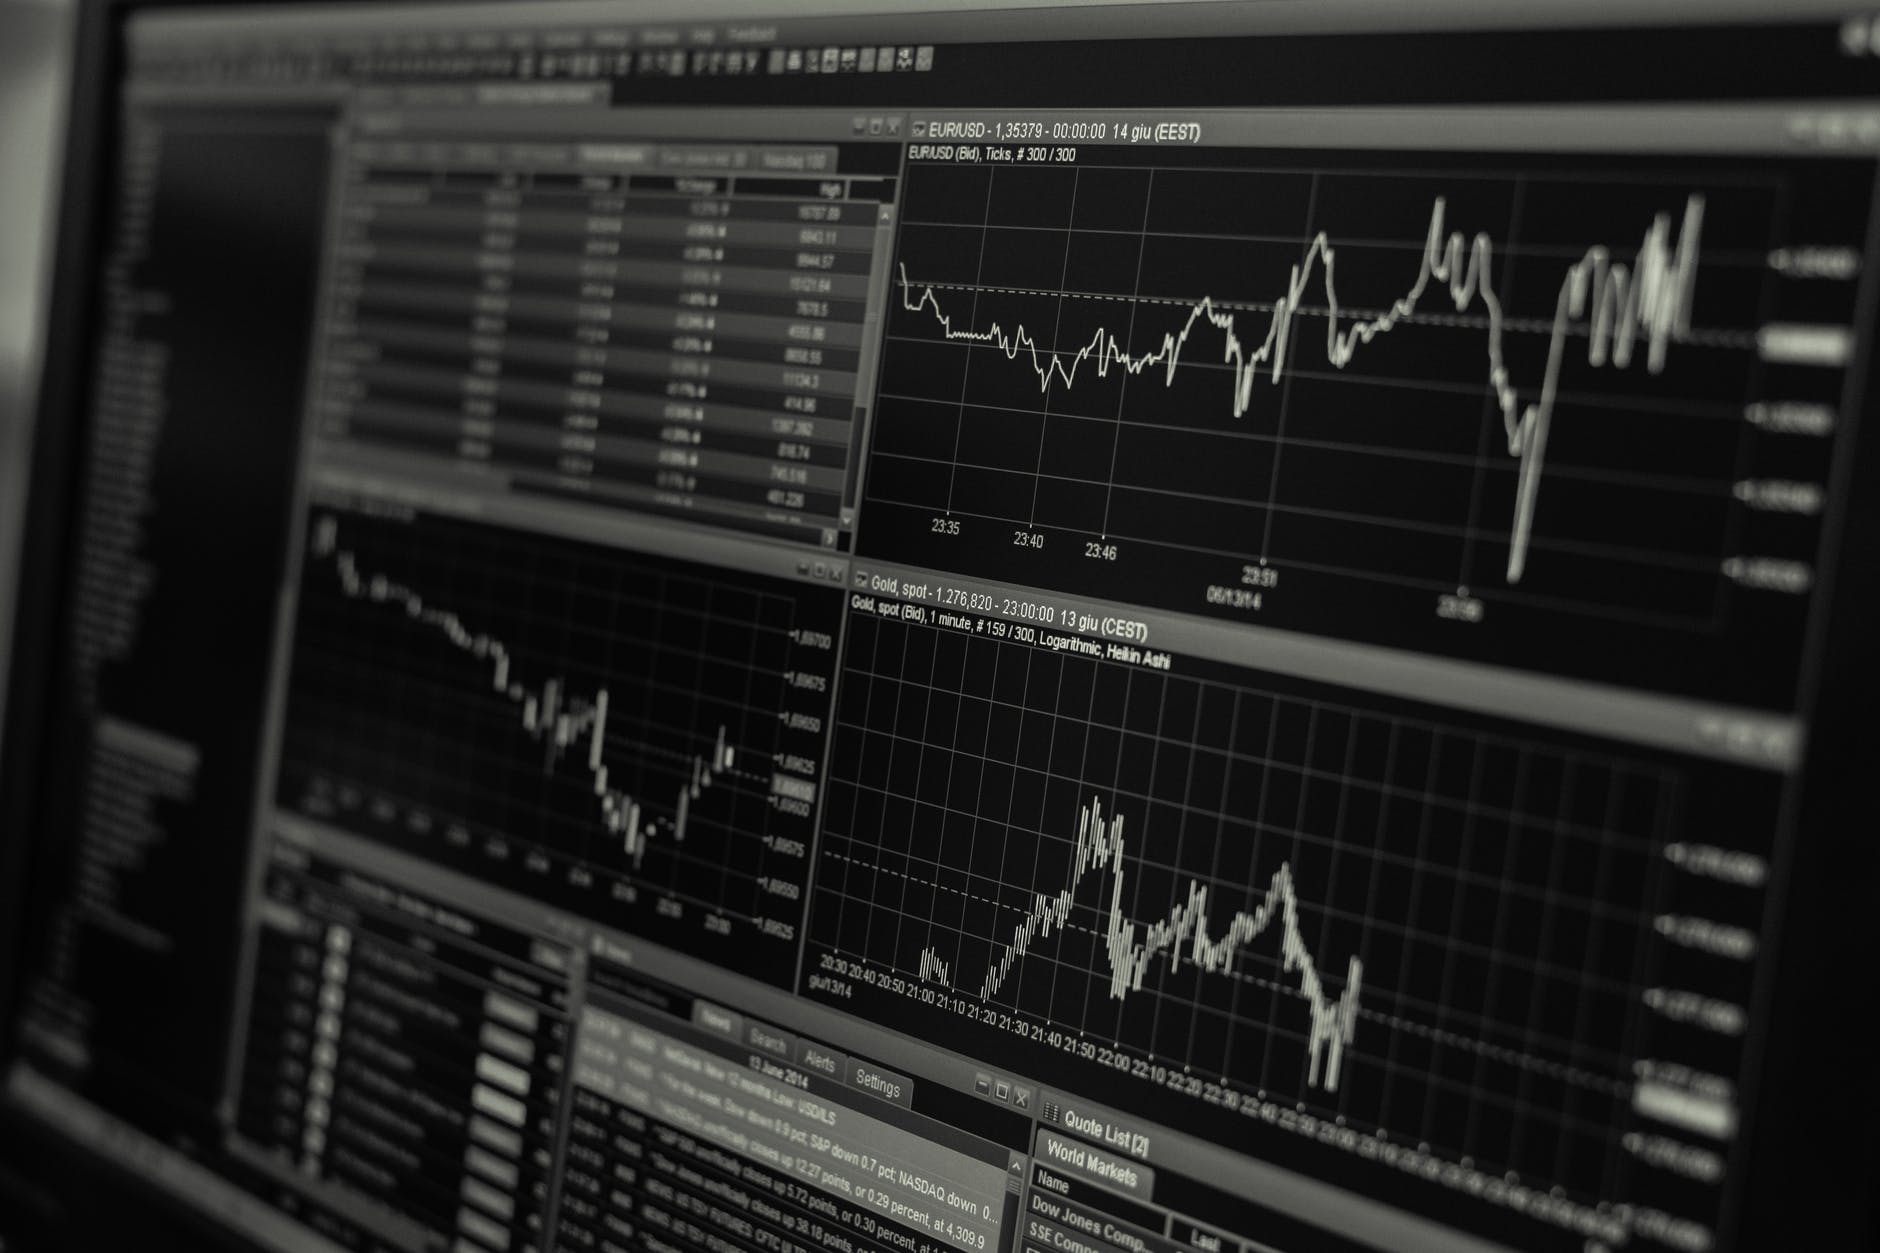 Brokerage giant eToro plans to go public